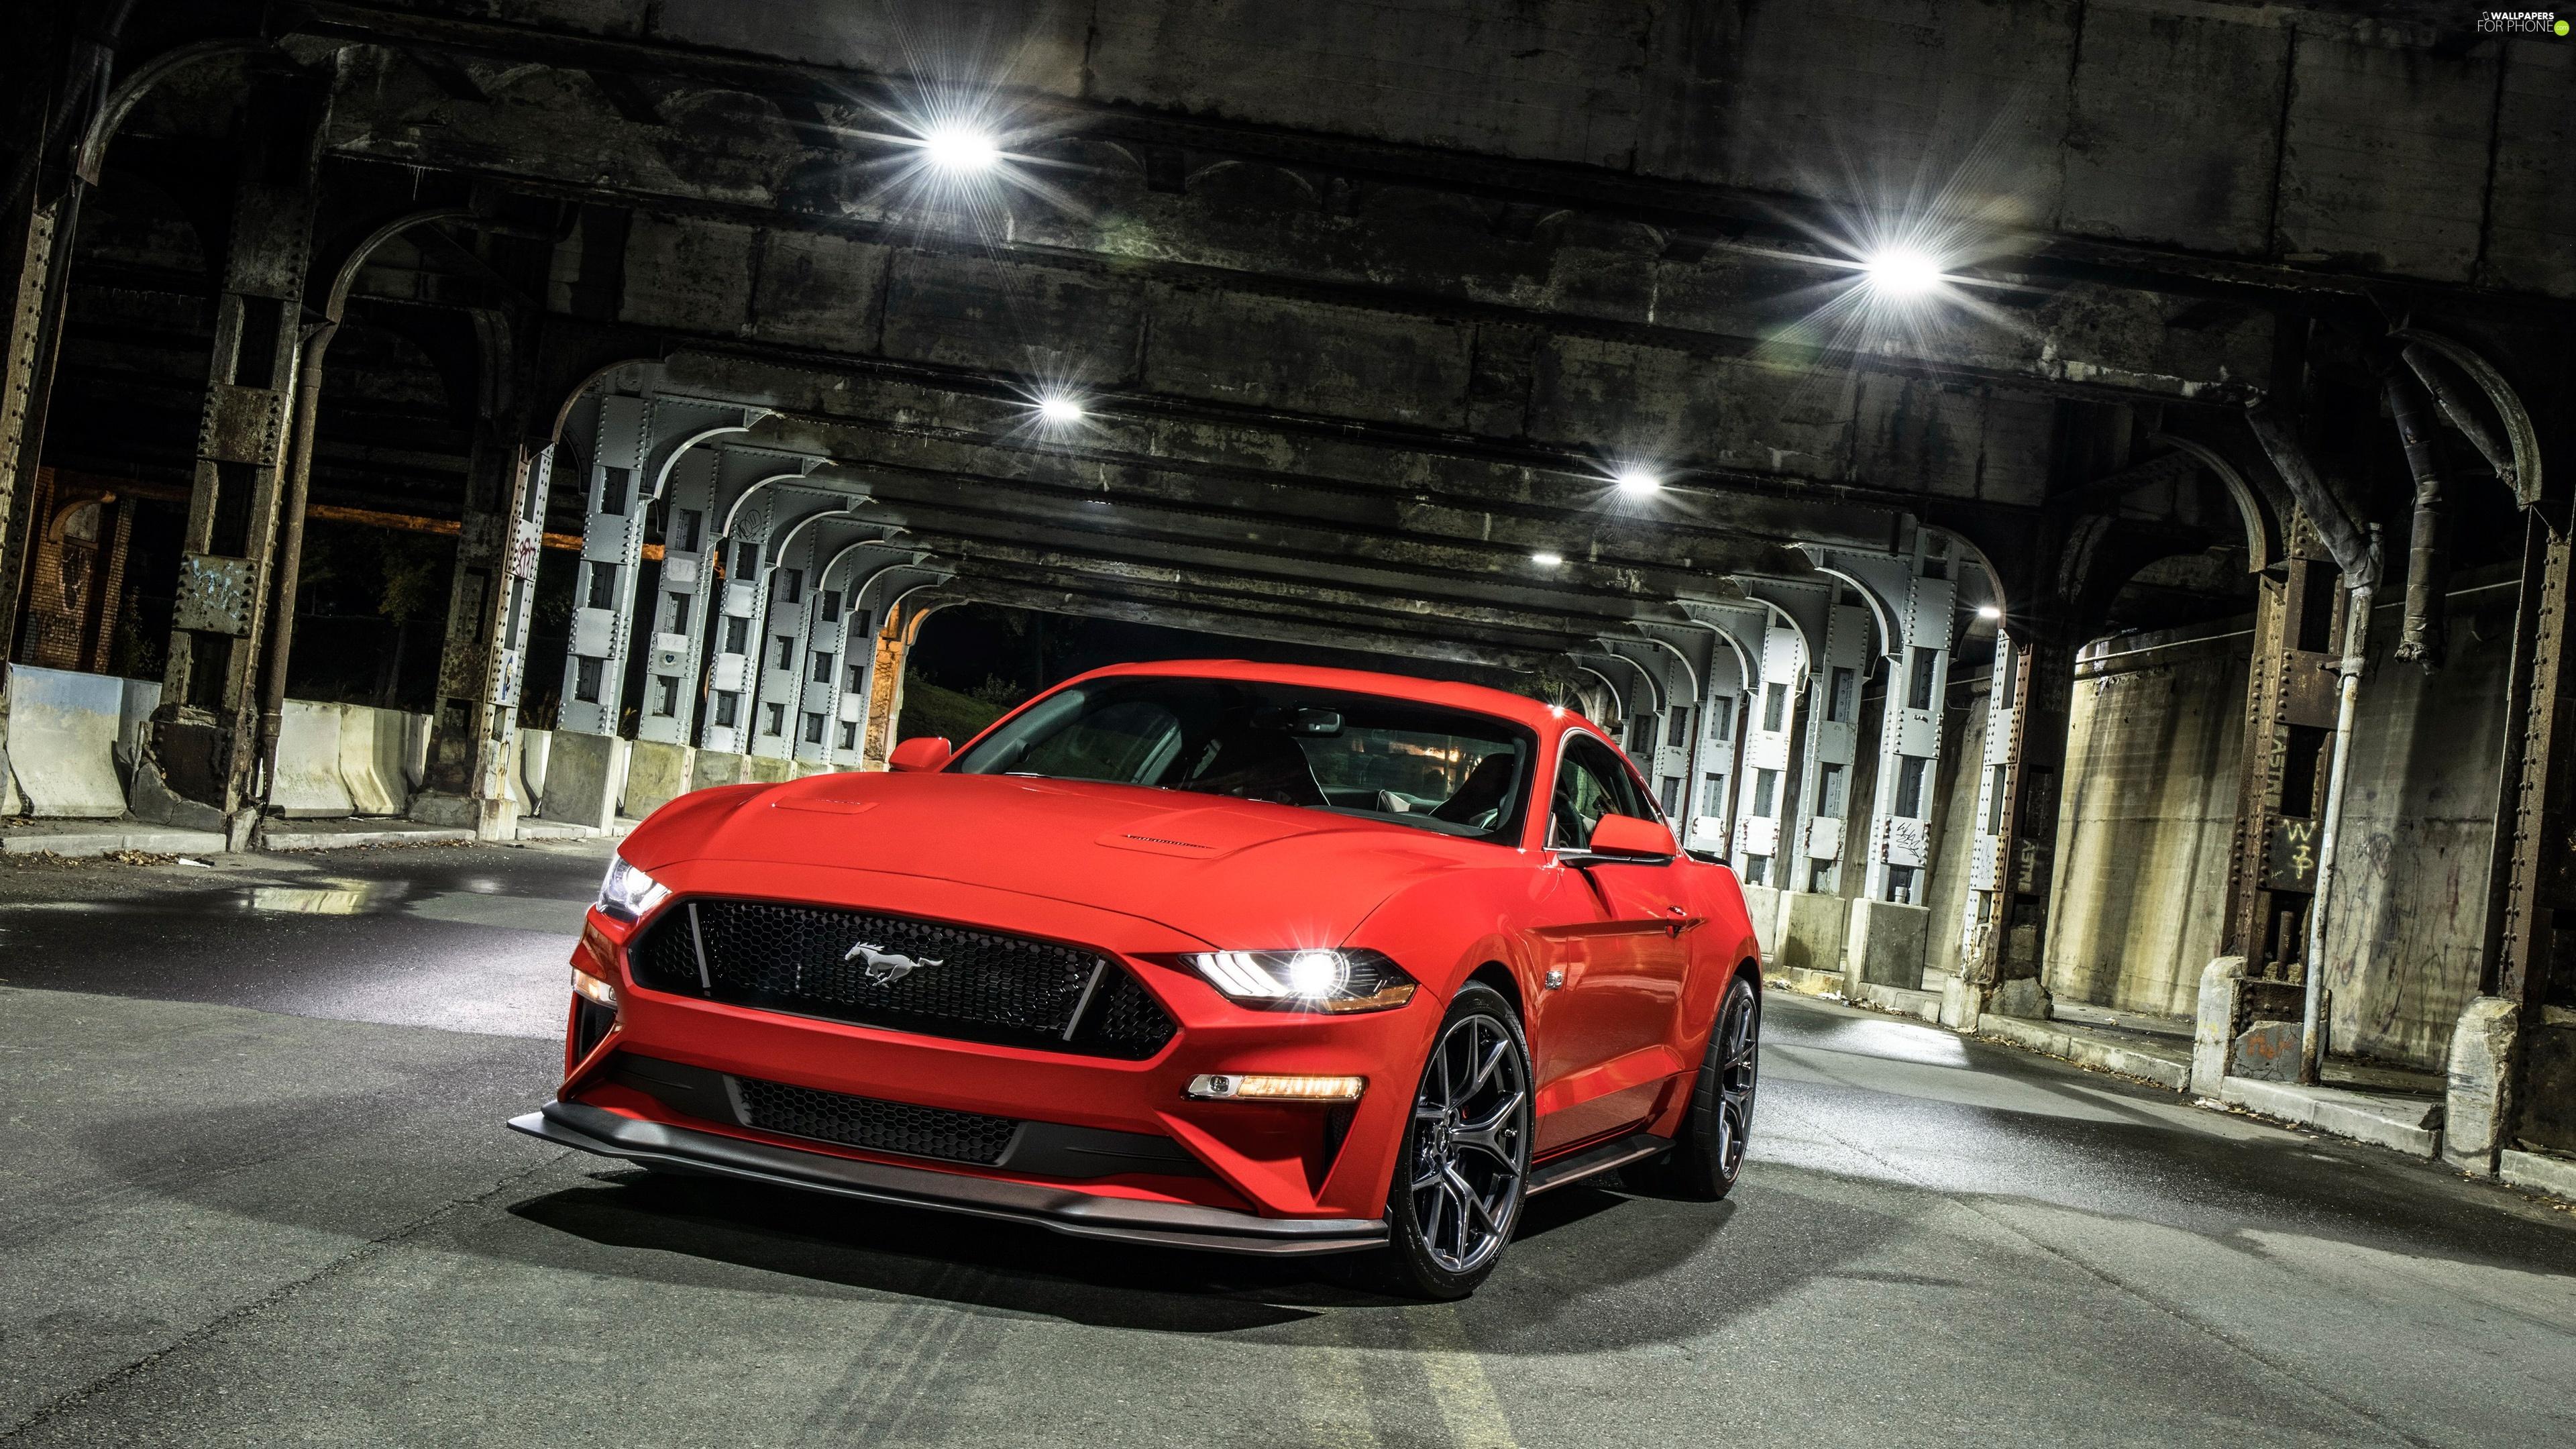 2018 Ford Mustang Nascar